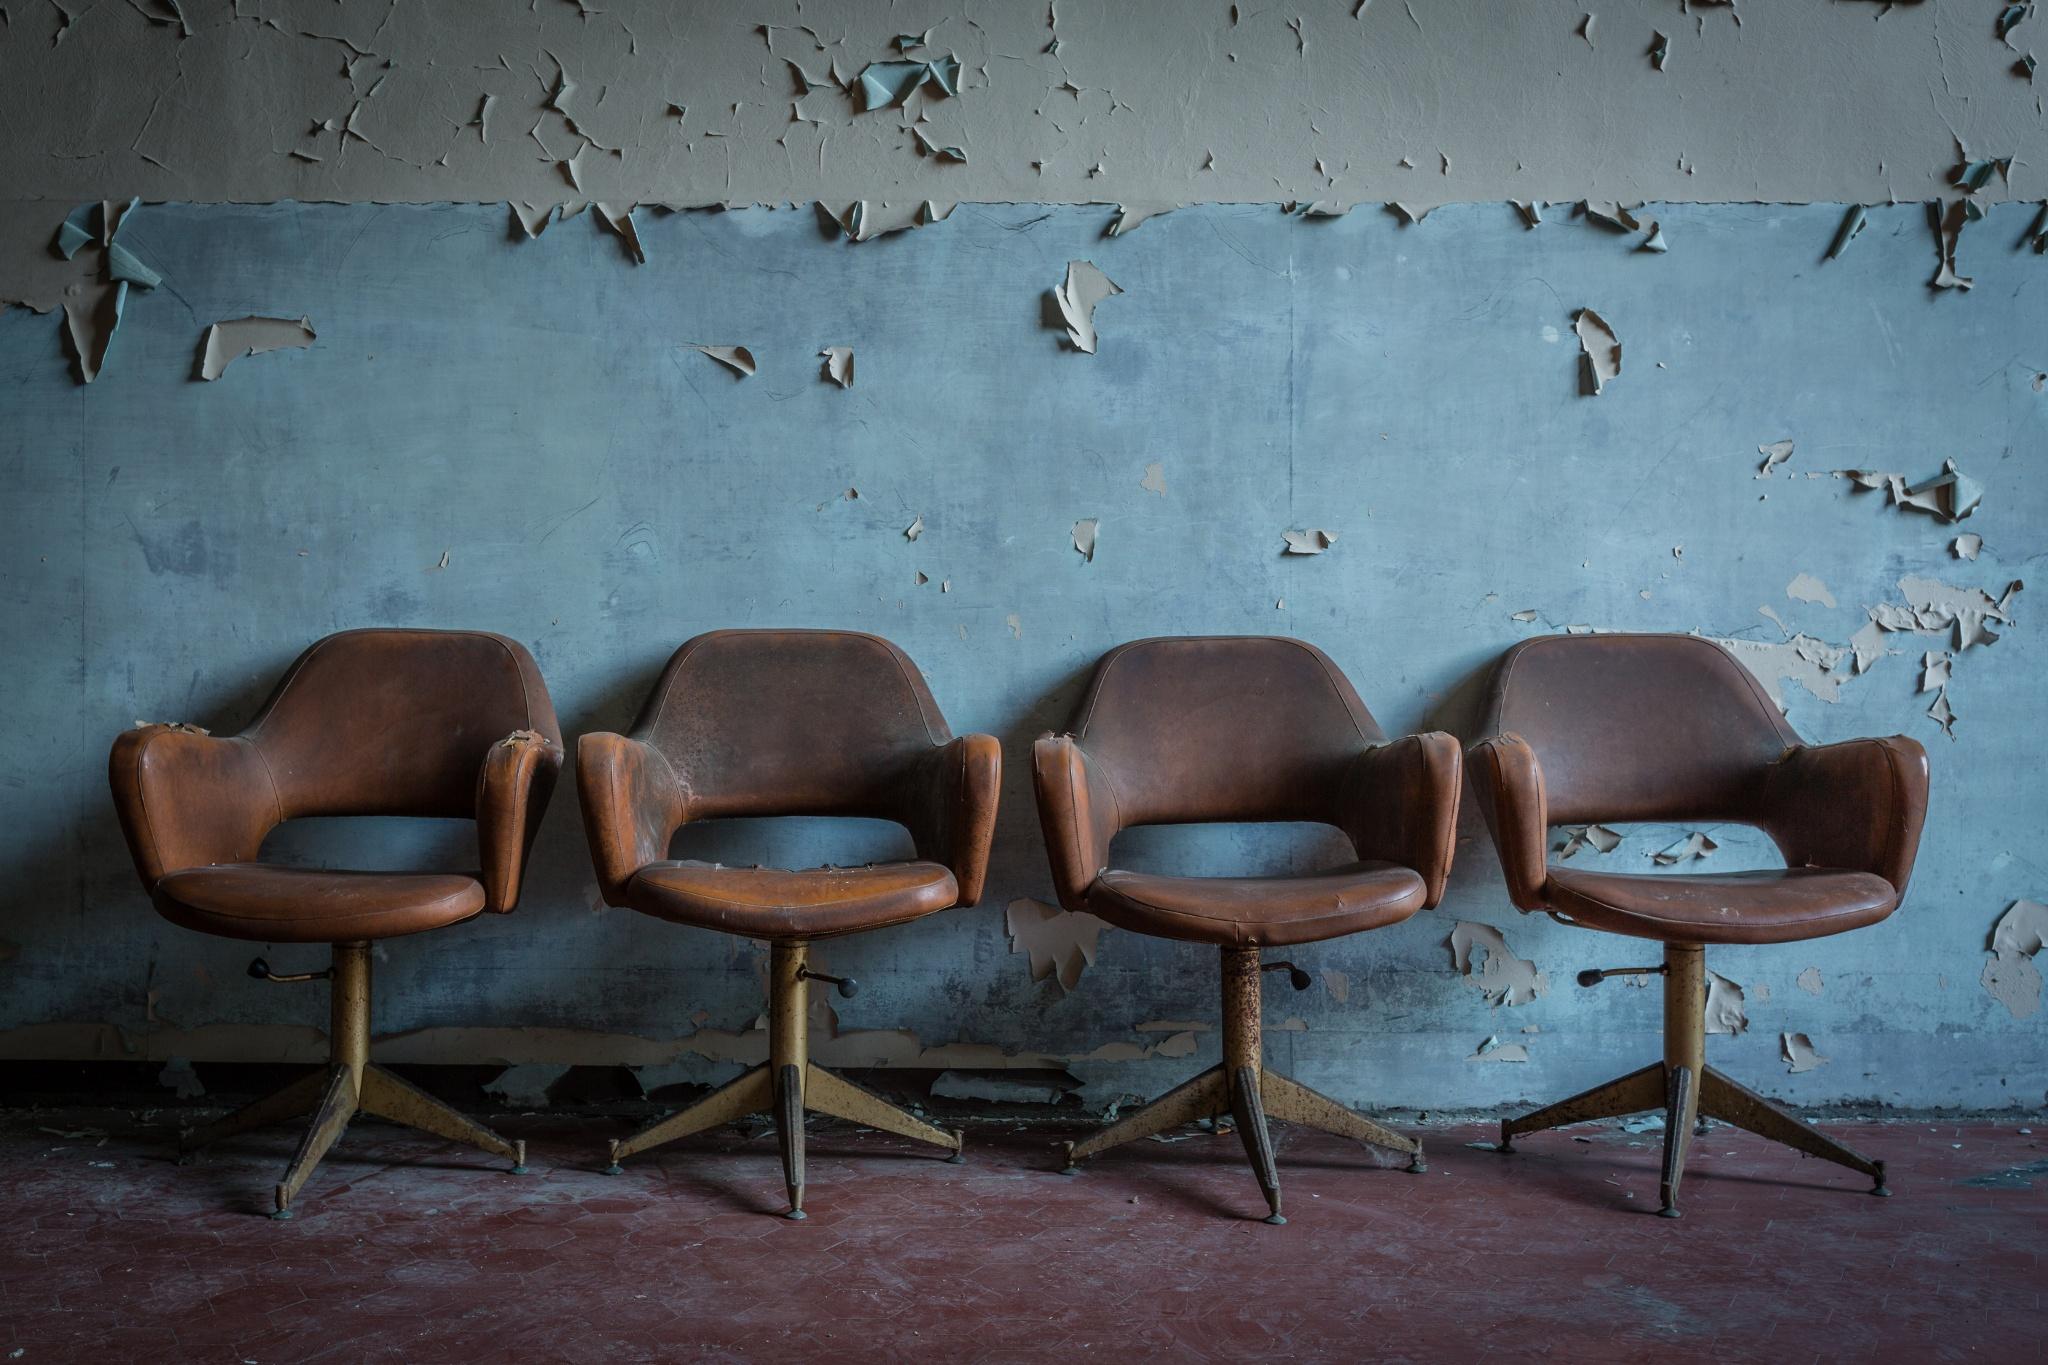 Abandoned psychiatric hospital 16